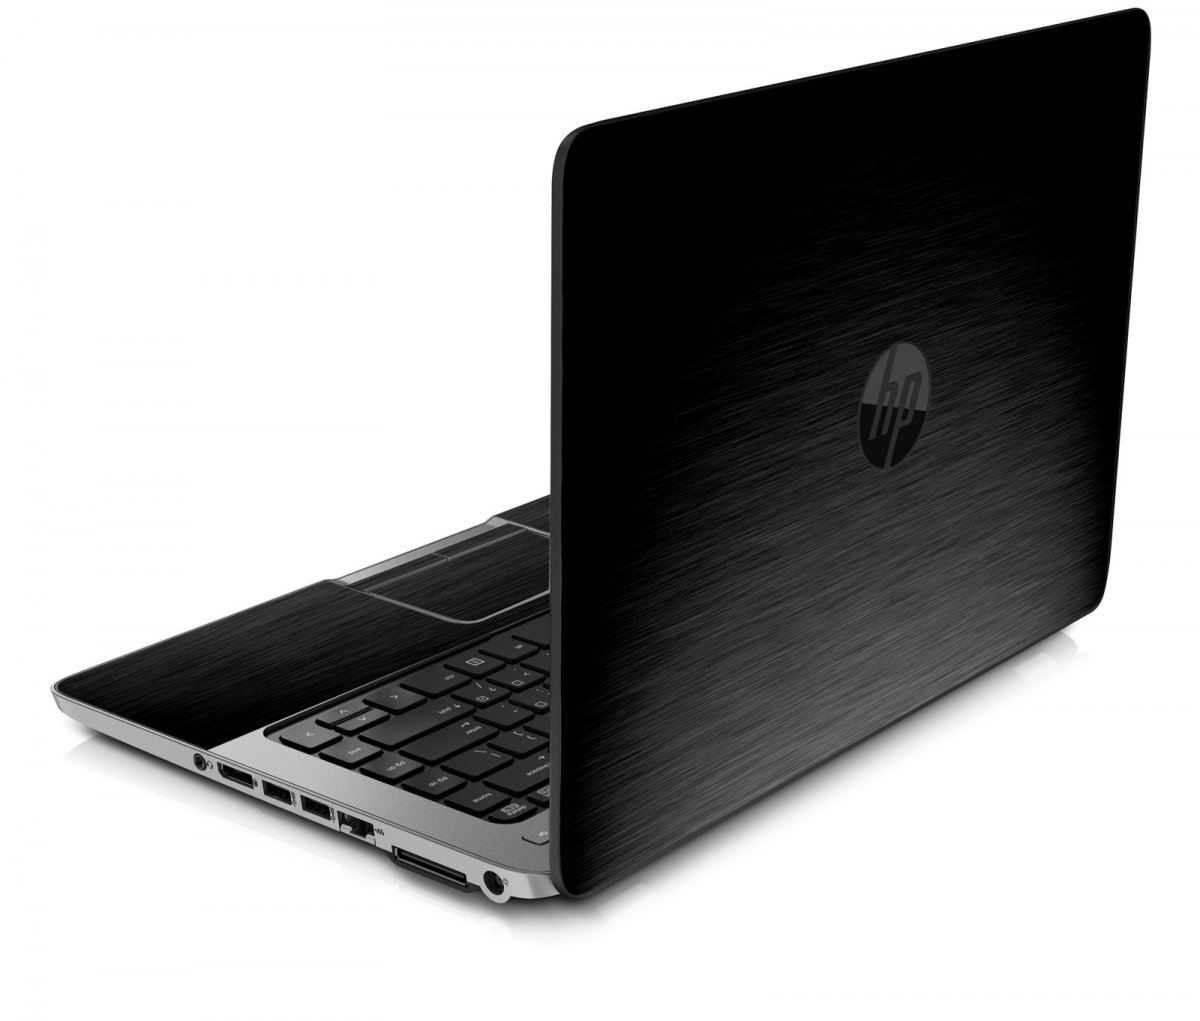 MTS TEXTURED BLACK HP ProBook 850 G1 Skin